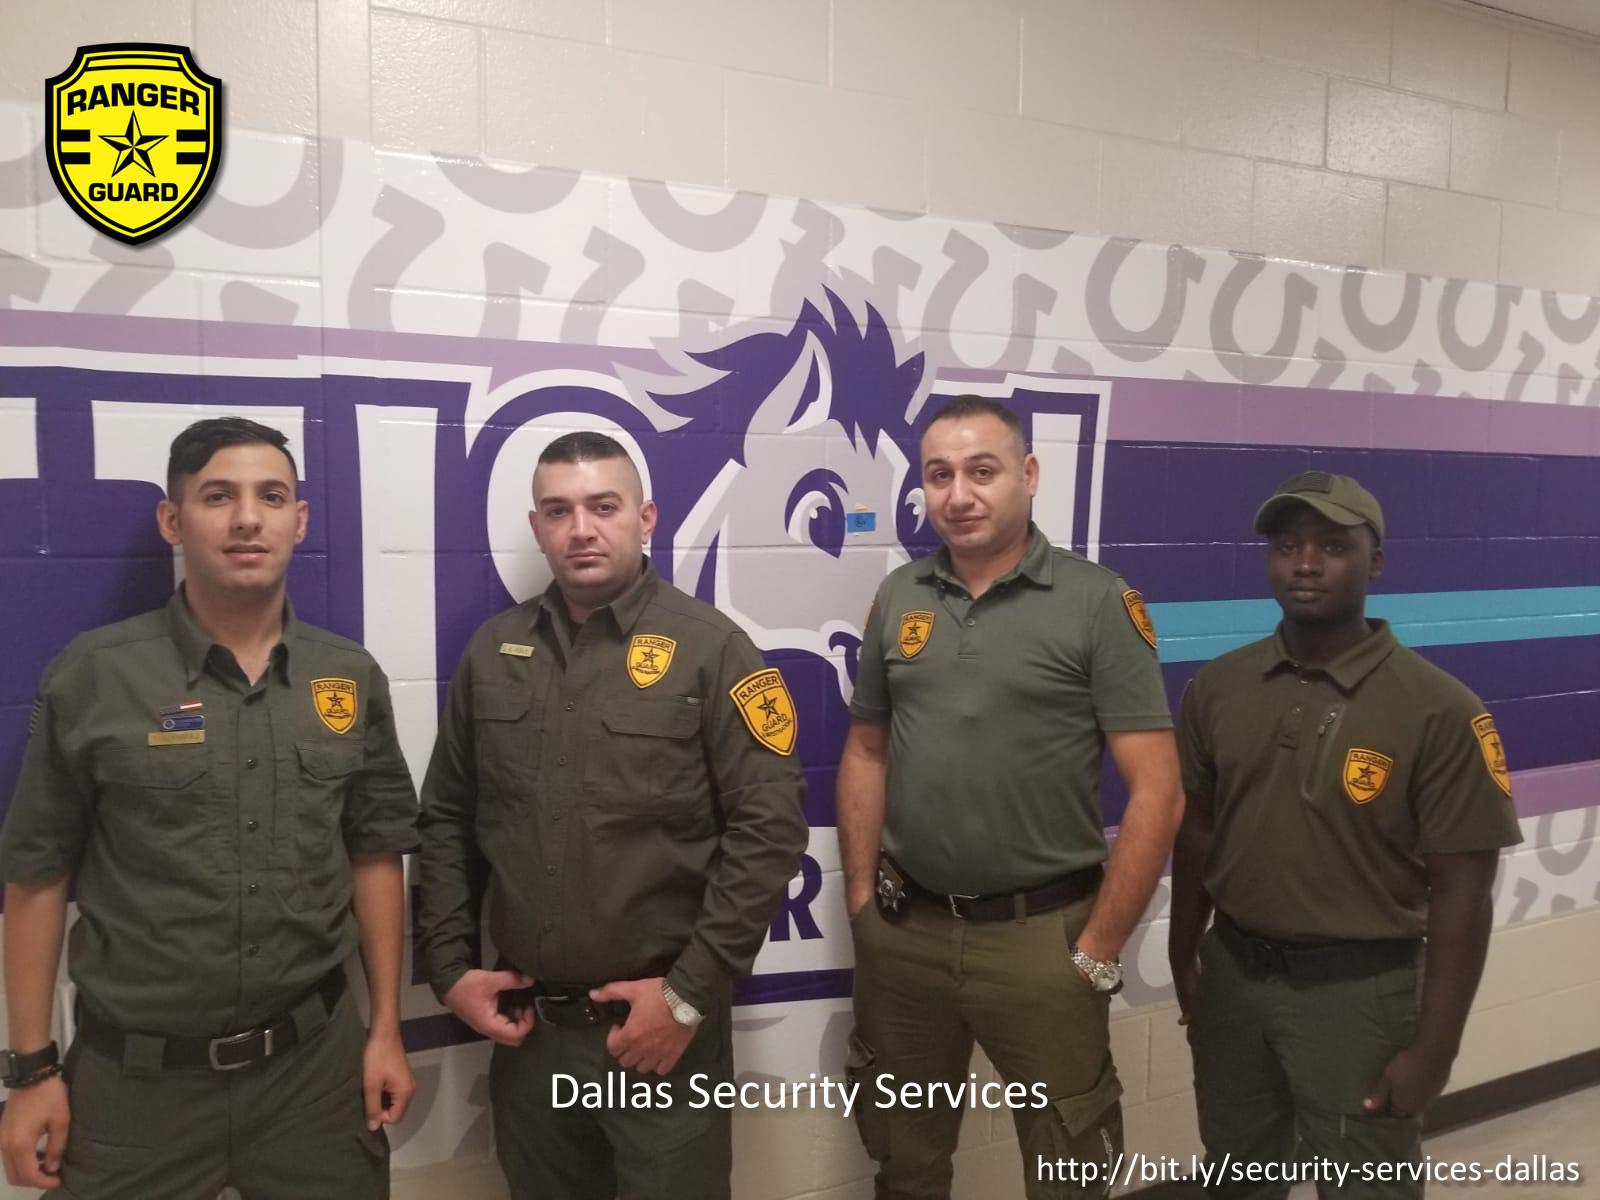 Ranger Guard and Investigations Dallas Launches Dallas Security Services